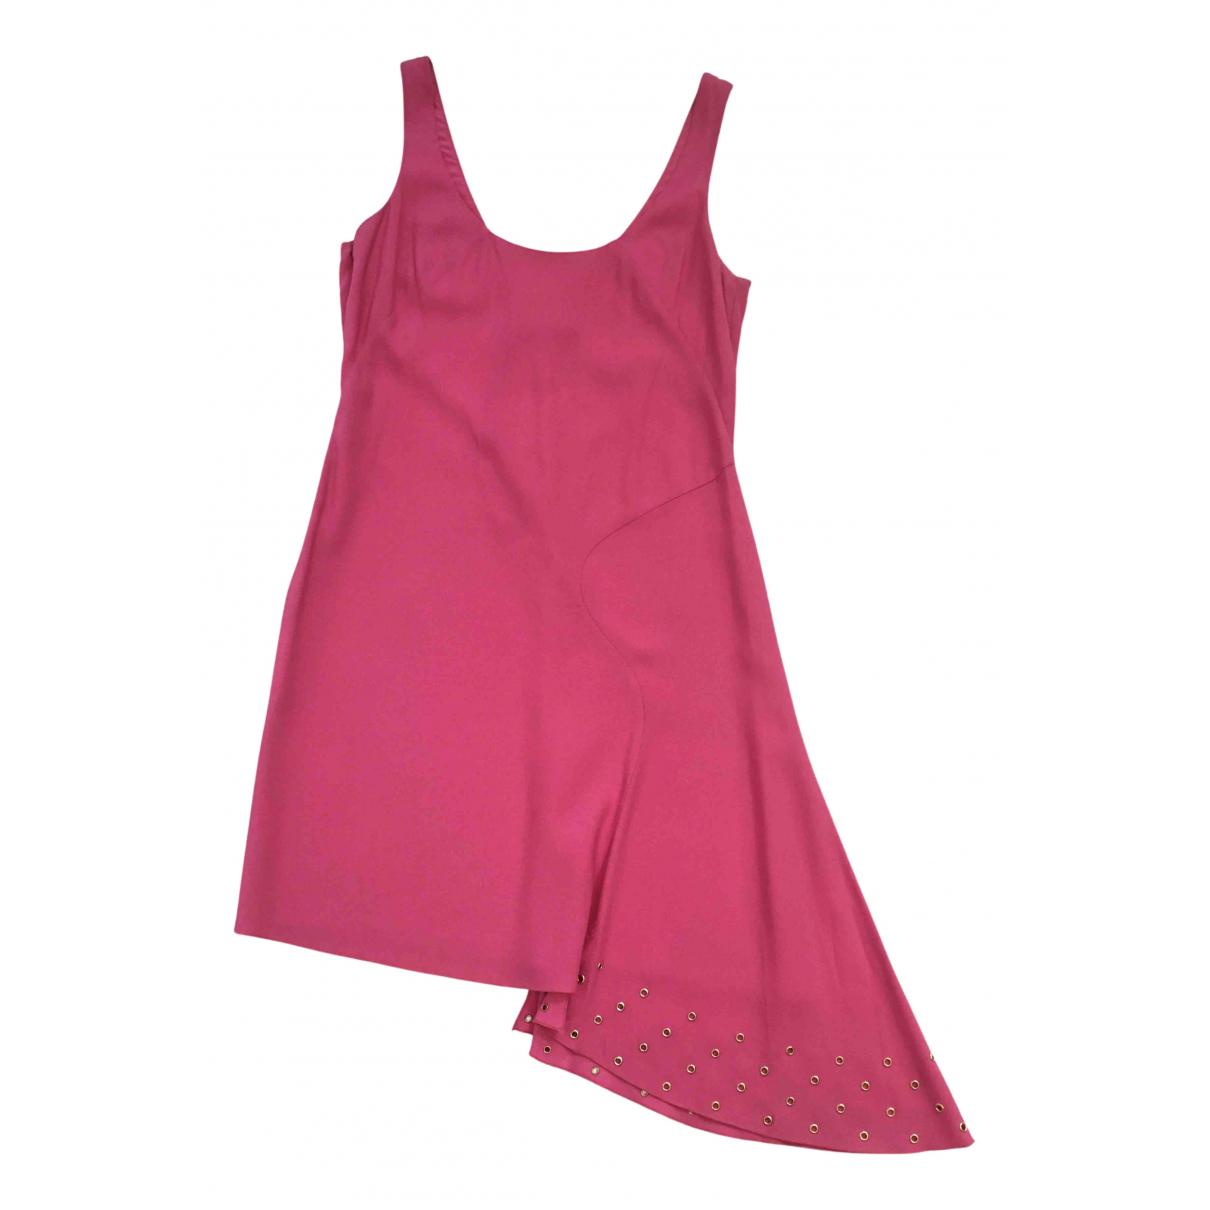 Versace N Pink dress for Women 10 UK